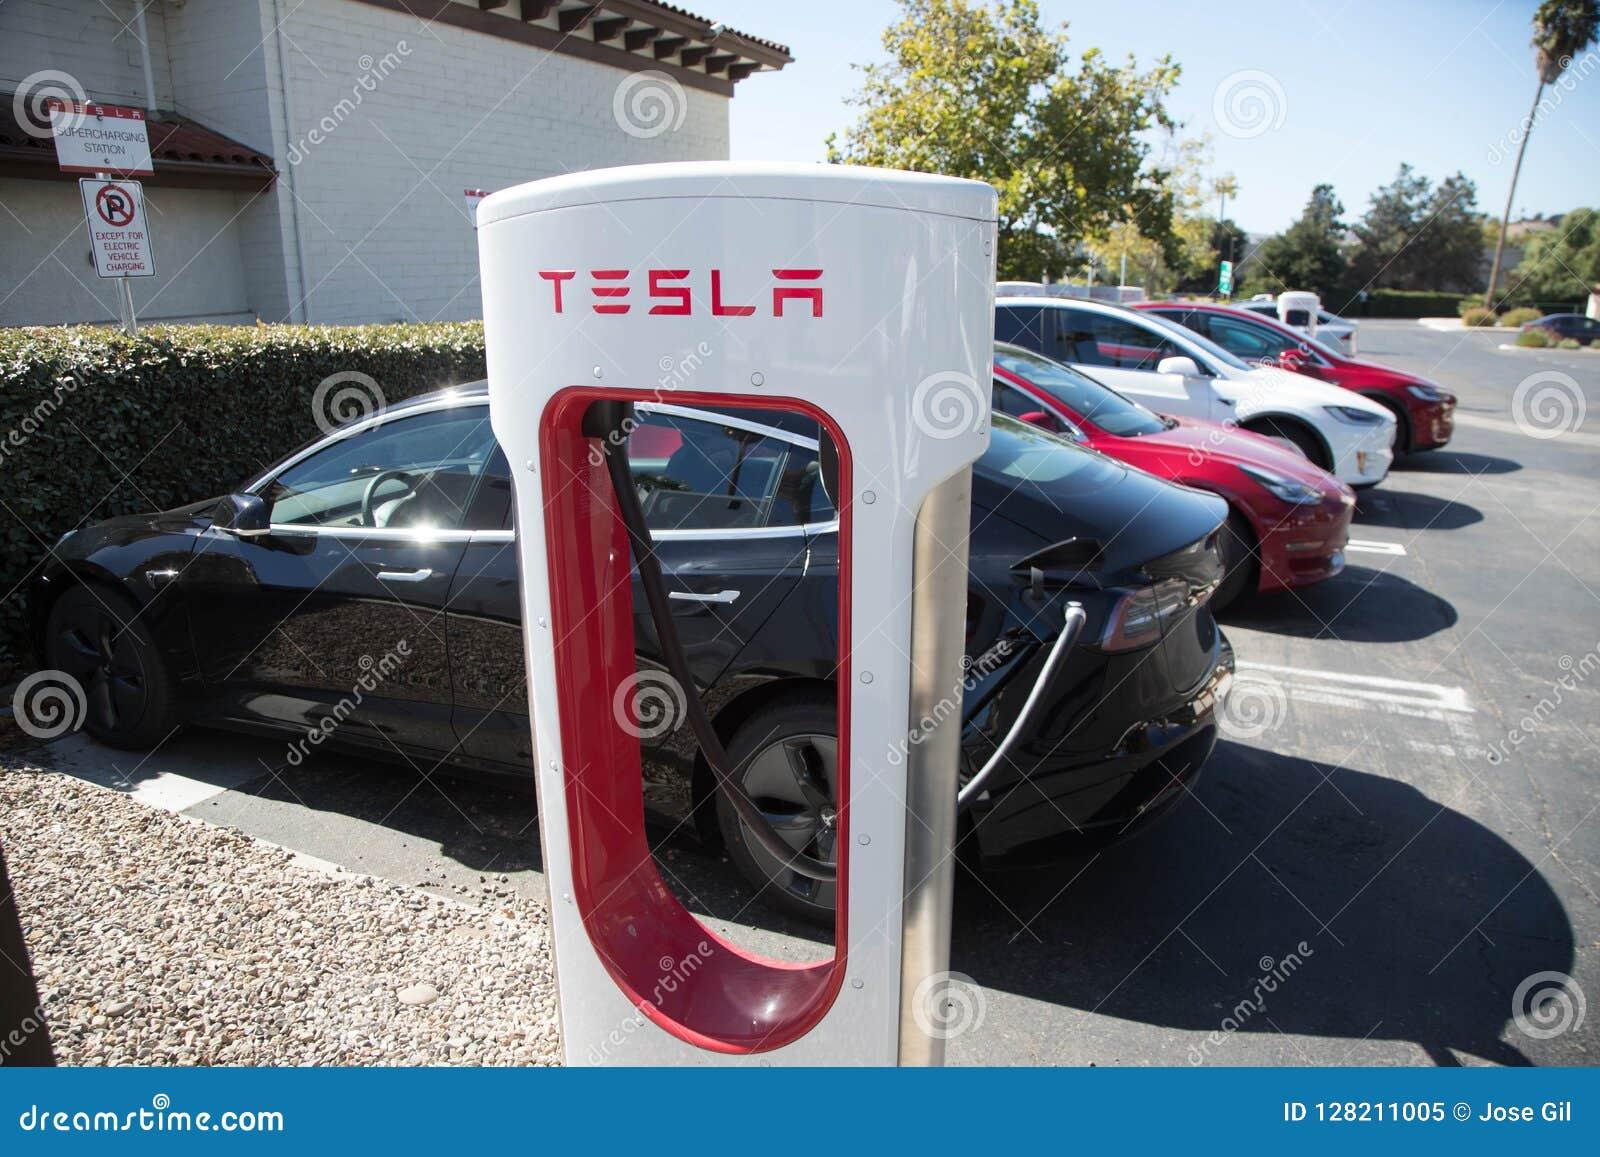 Tesla Superchargers 3 editorial image  Image of motors